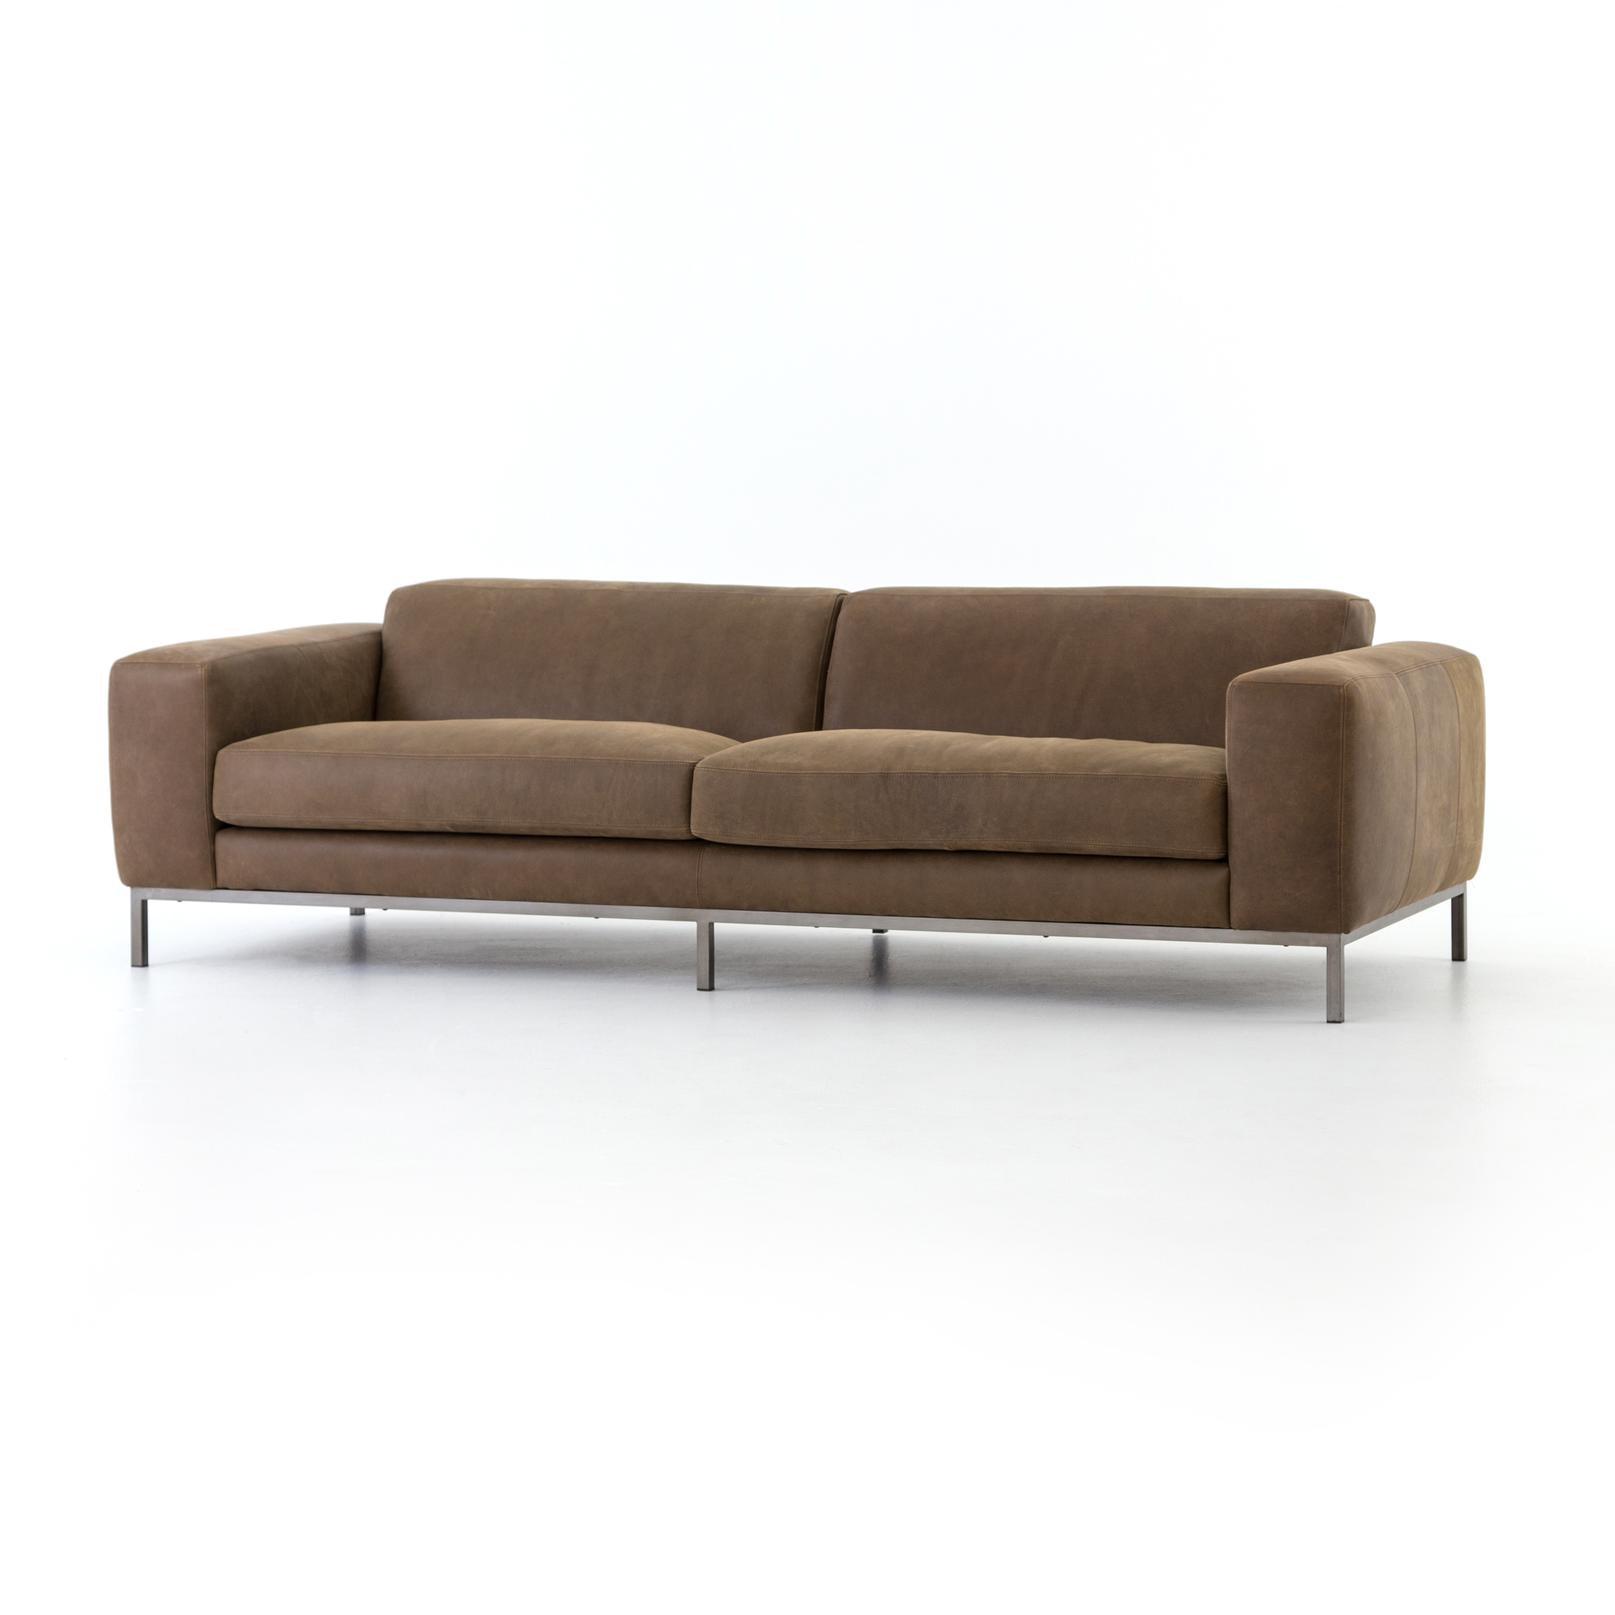 Four Hands Benedict Leather Sofa 96 Umber Grey CKEN 12748 061 In Portland,